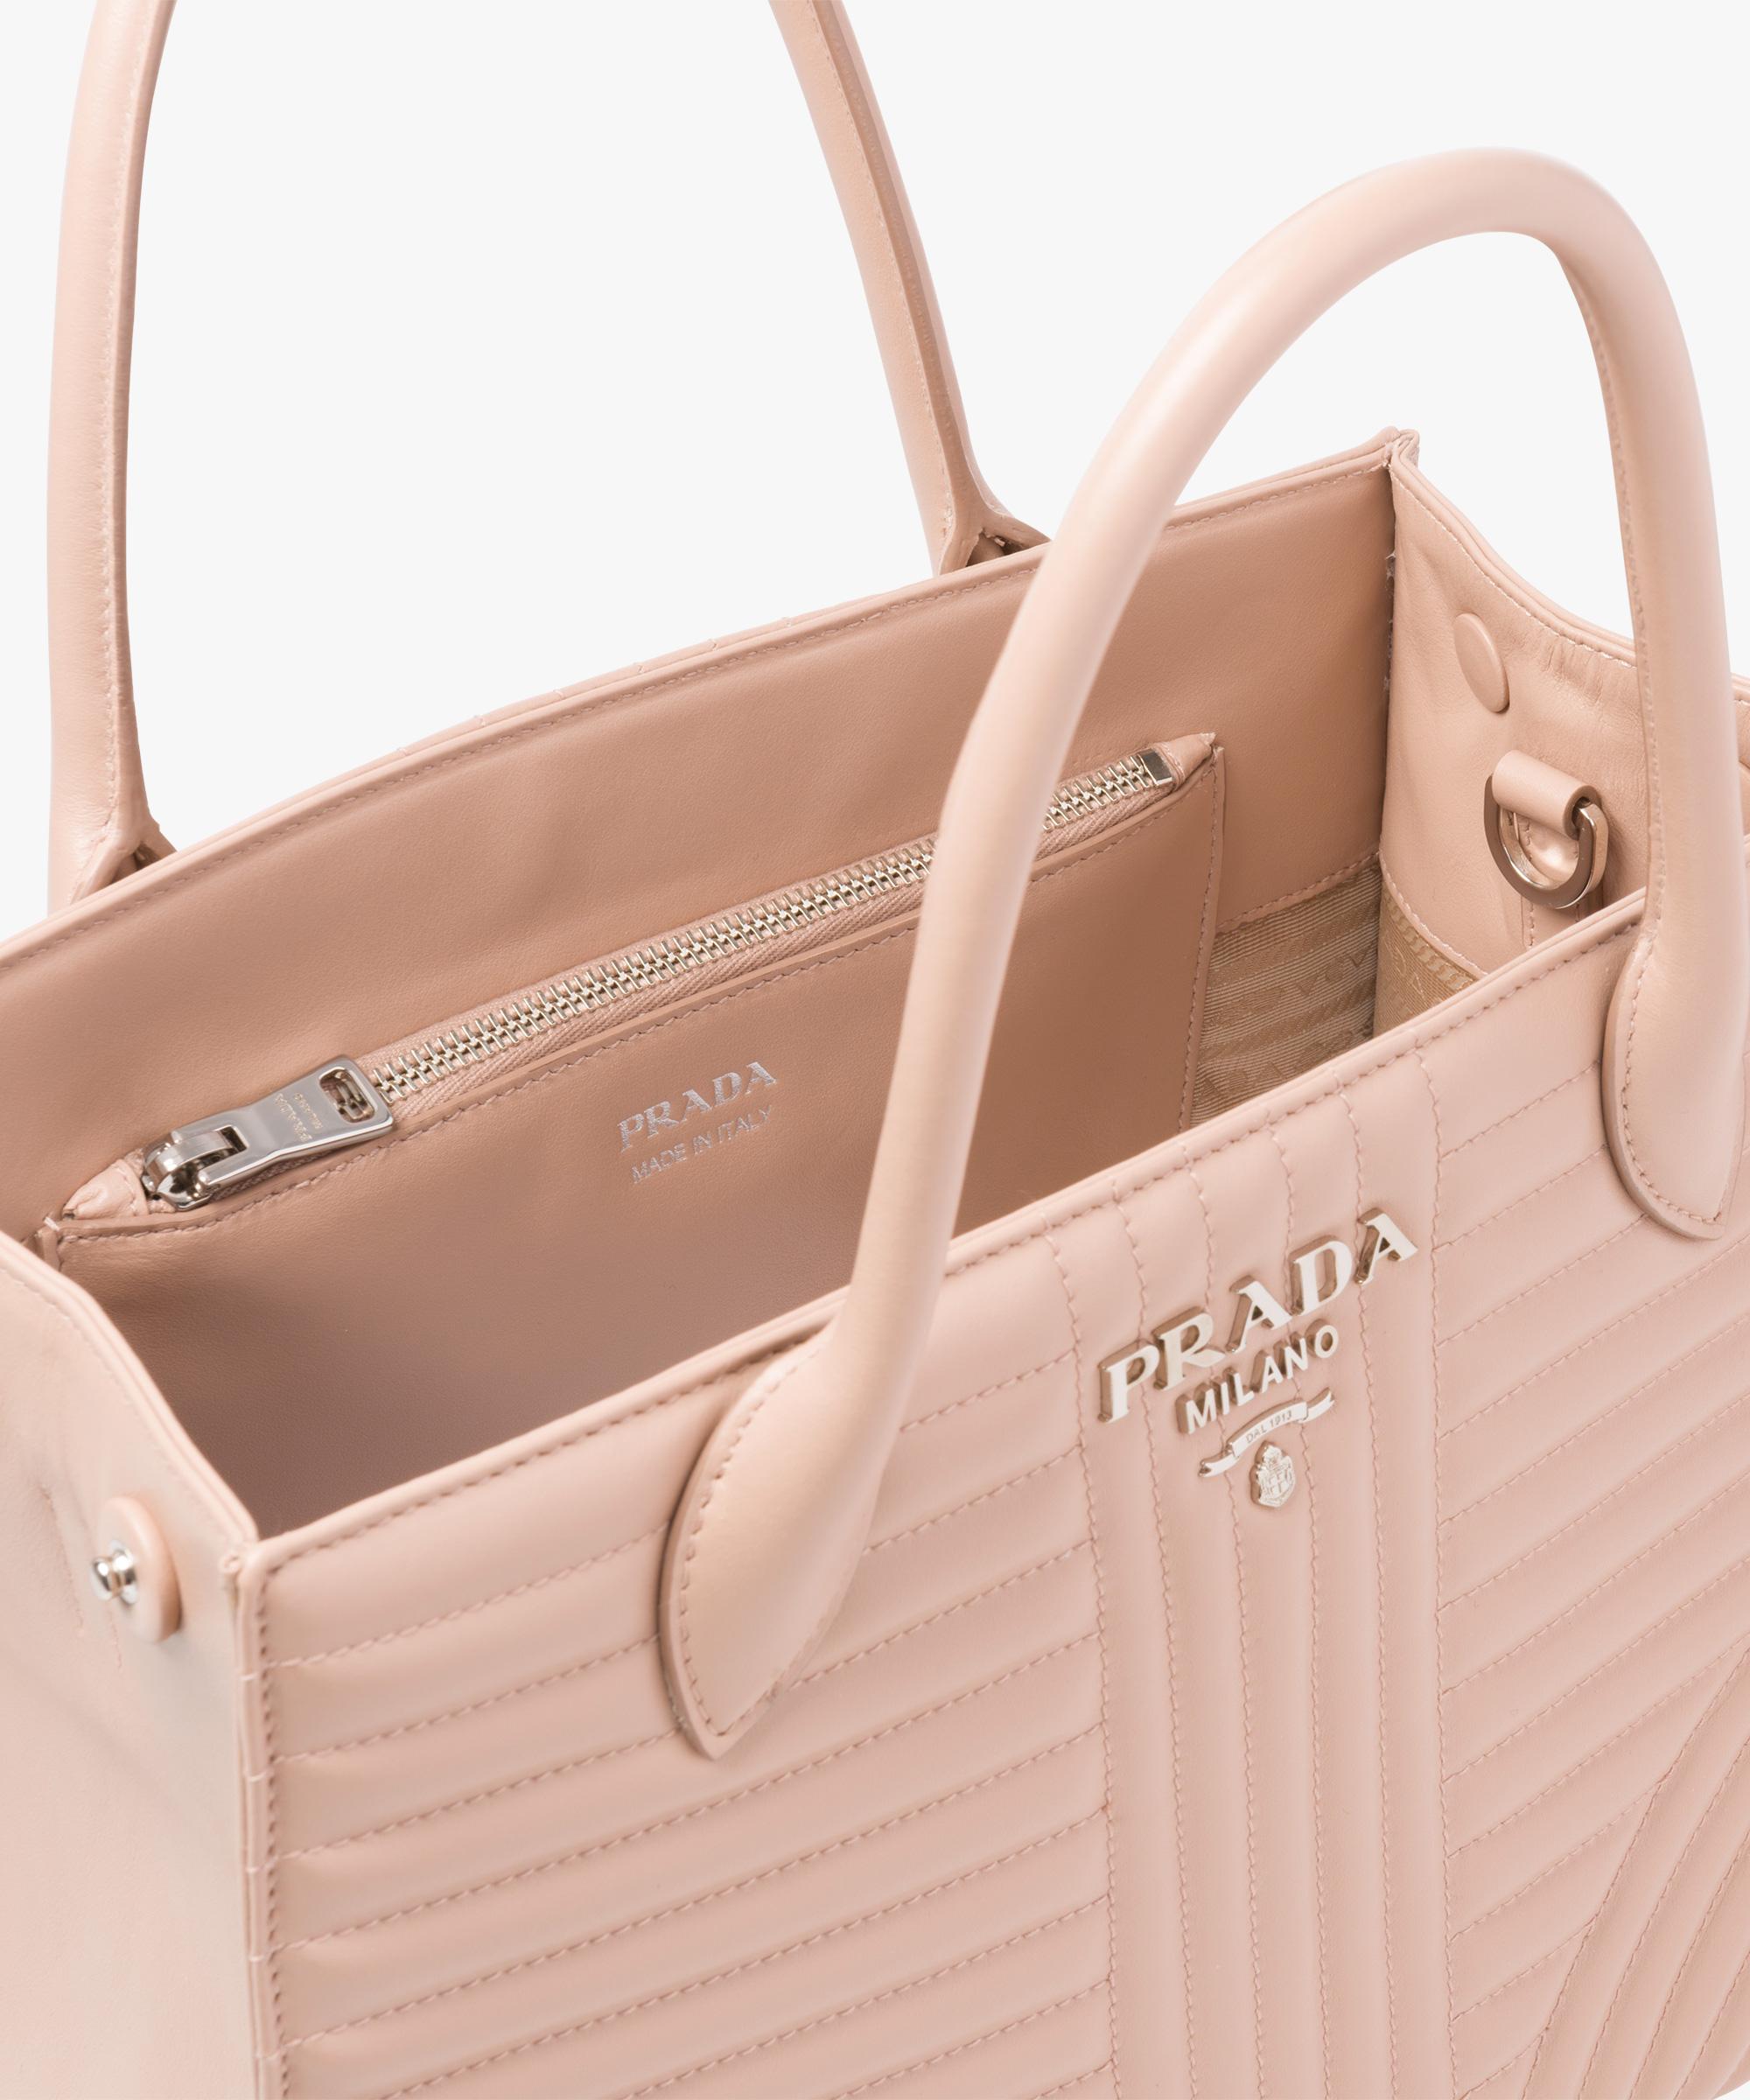 428c4b3f6978 Prada Diagramme leather handbag Prada POWDER PINK ...